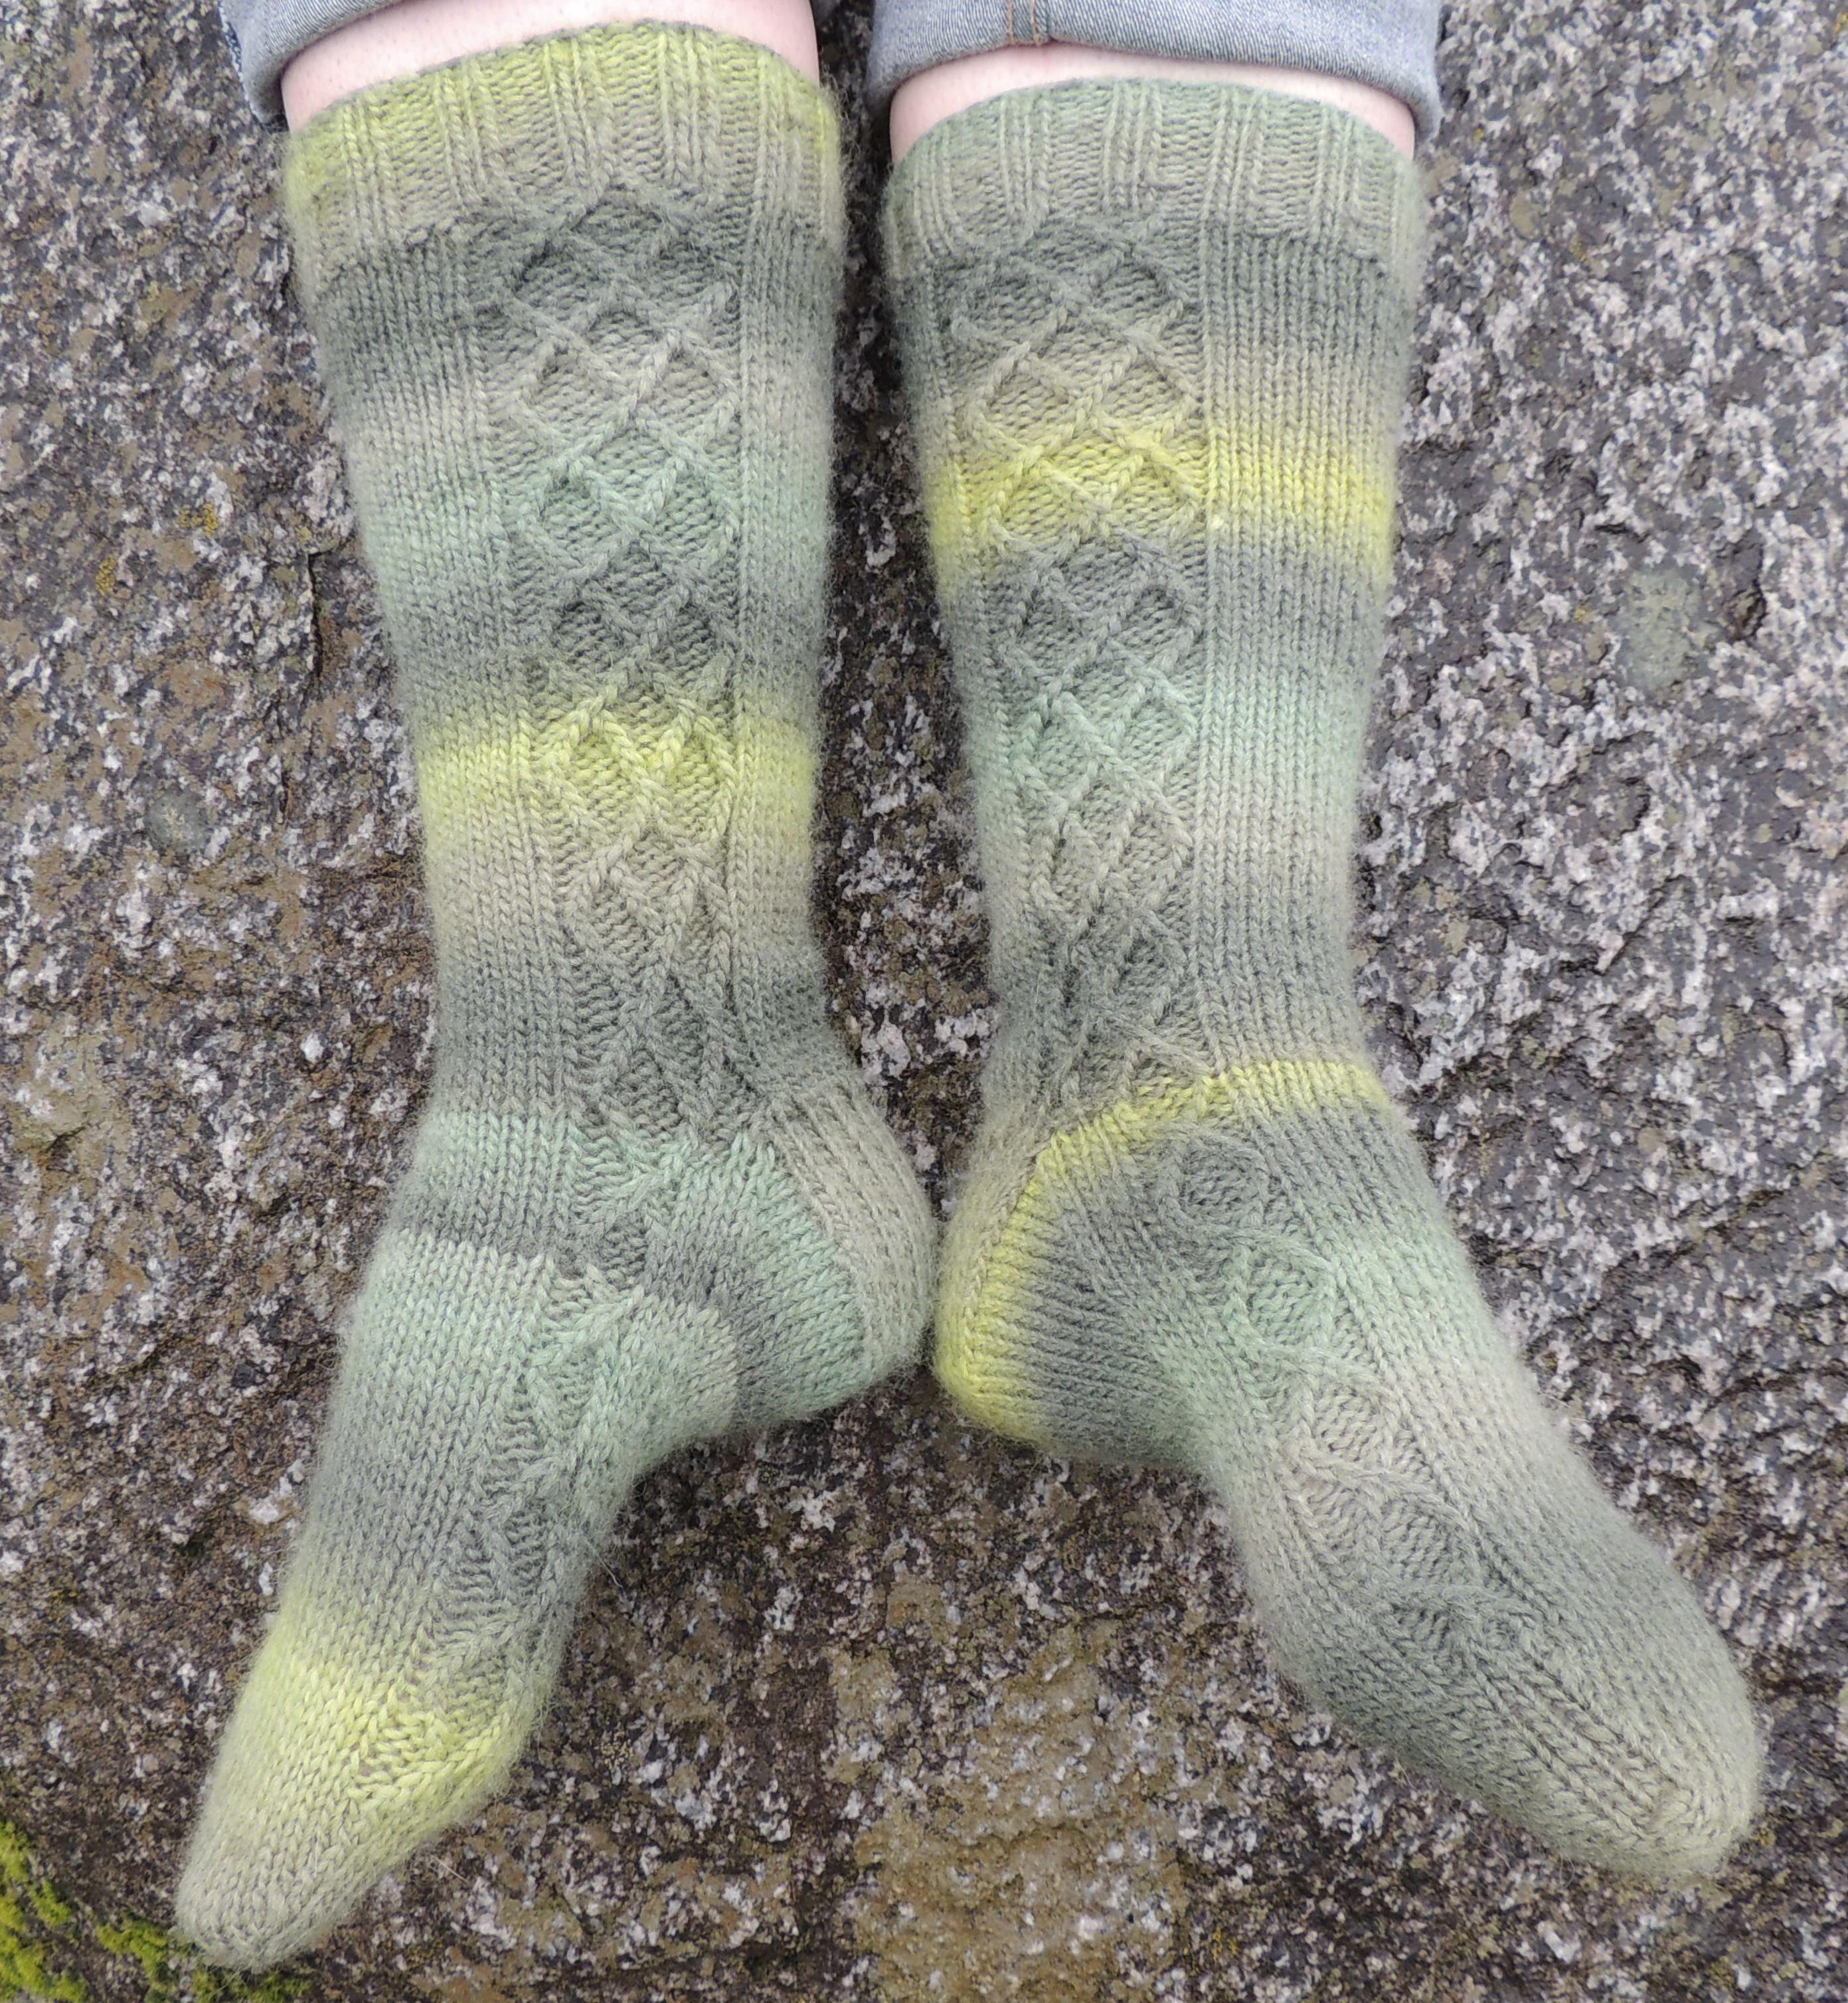 Argyle Trellis Wooly Socks Pattern - Knitting Patterns and Crochet Patterns f...